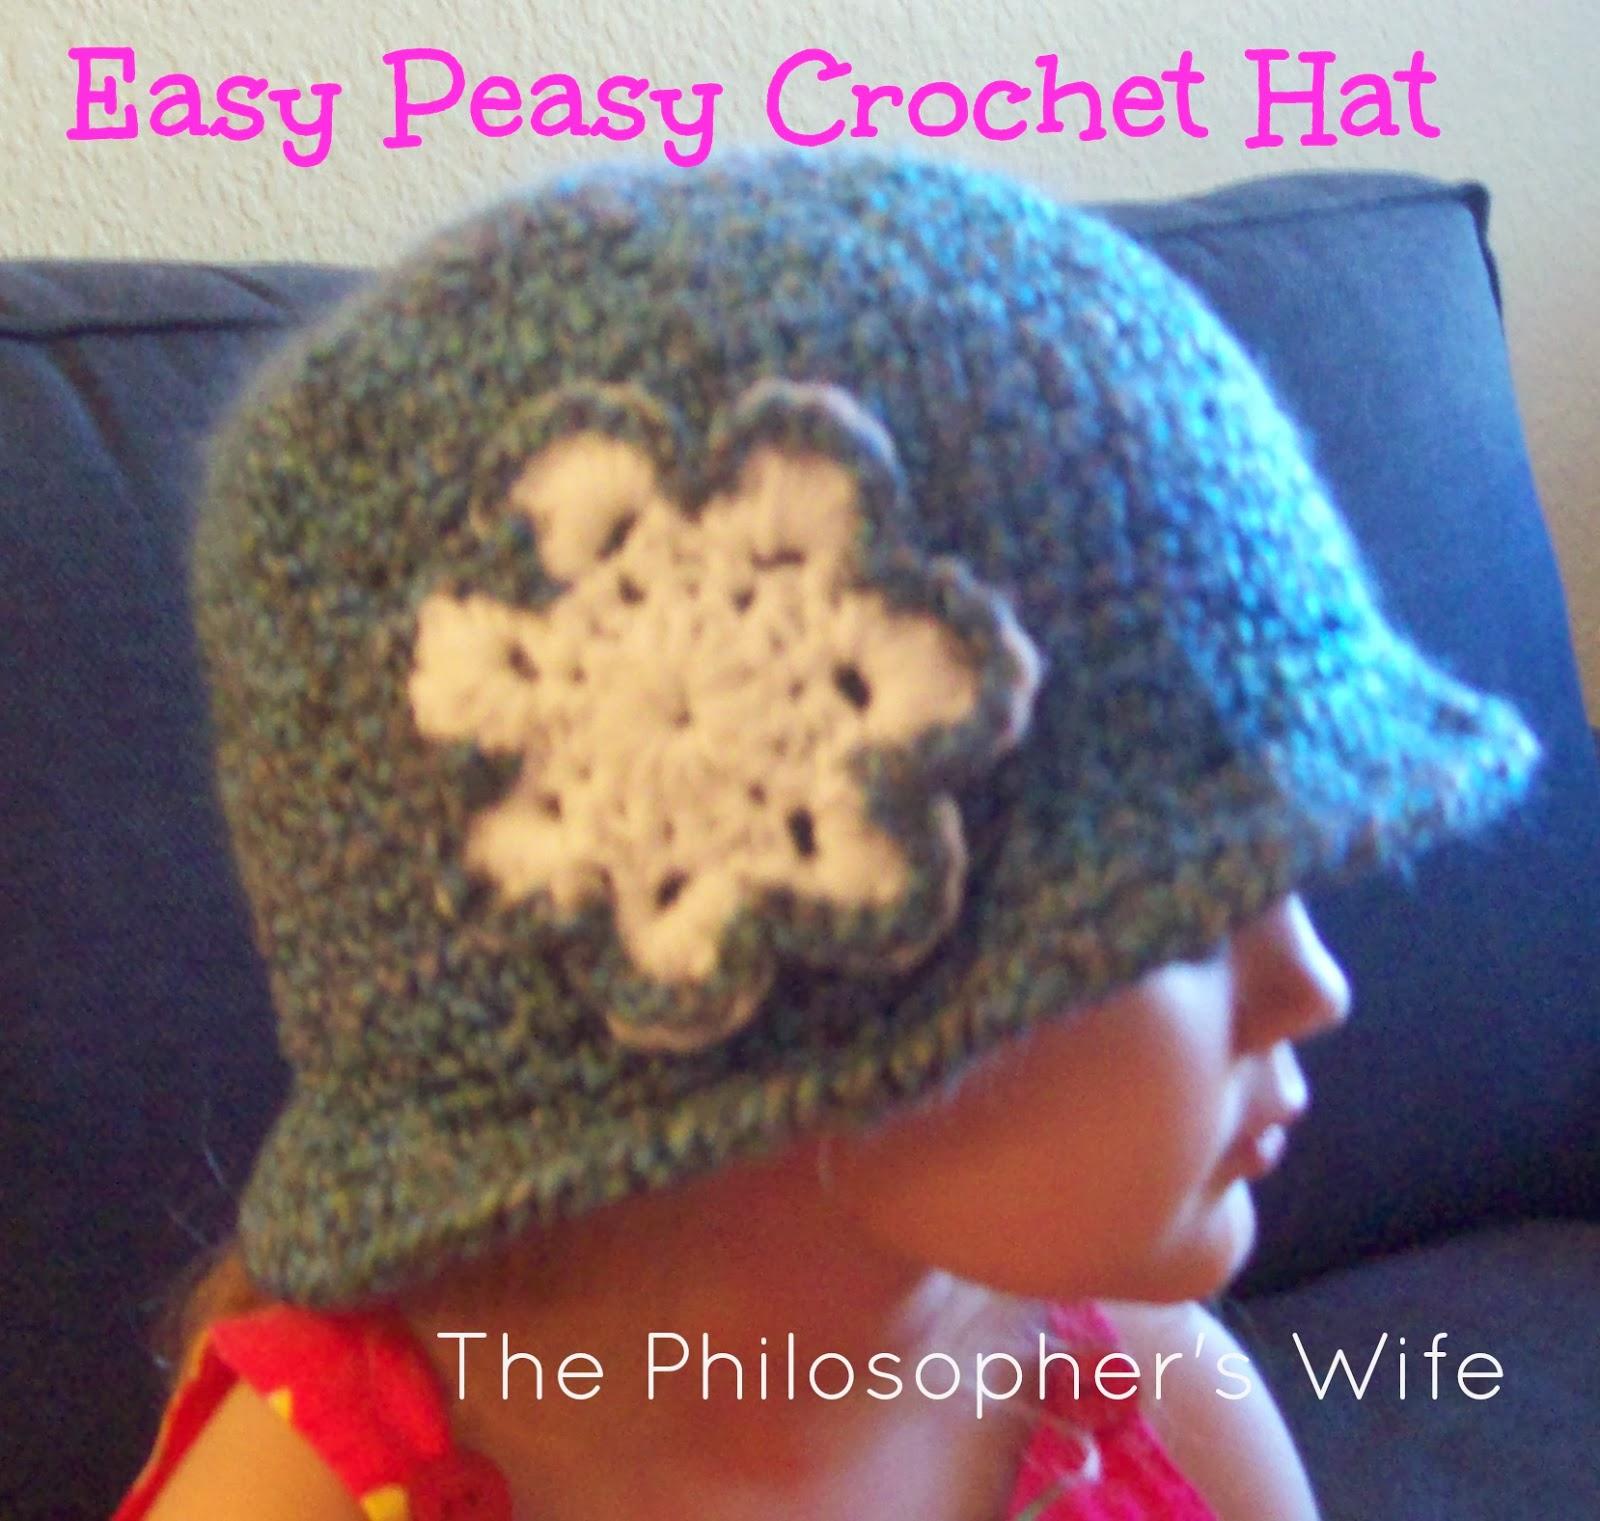 Easy Peasy Crochet Hat Patterns : The Philosophers Wife: An Easy Peasy Crochet Hat